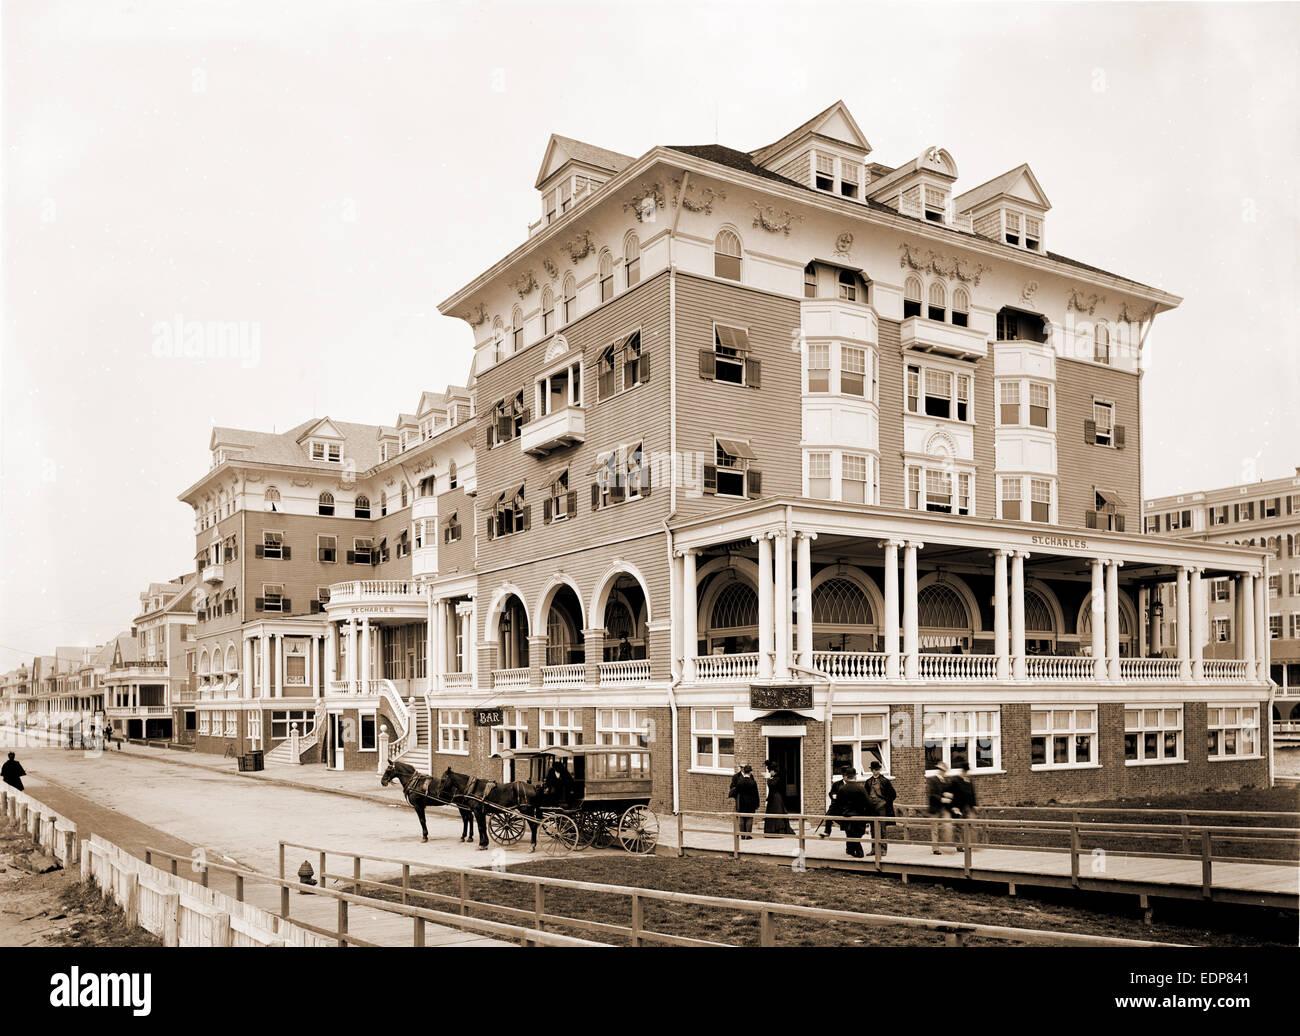 Hotel st charles atlantic city n j hotels united states new jersey atlantic city 1880